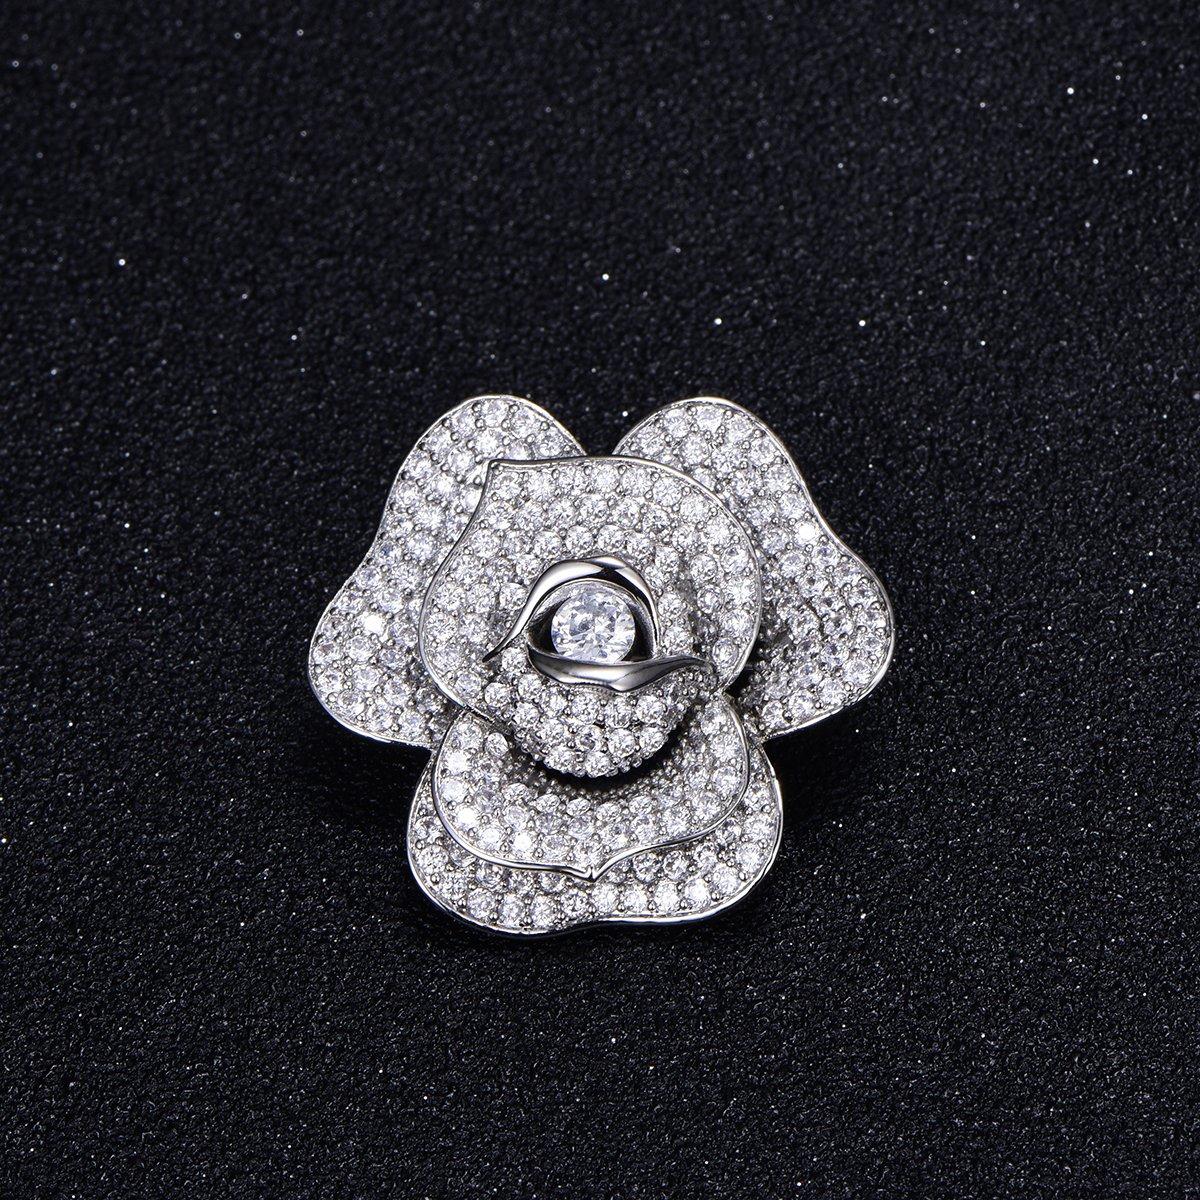 Flower Brooch Pins for Women,Dazzling Rhinestone Brooch for Brides Copper Vintage Crystal Brooch Girls CZ Brooch for Wedding,Party (Silver Plated Flower Brooch) by YOYOMA (Image #2)